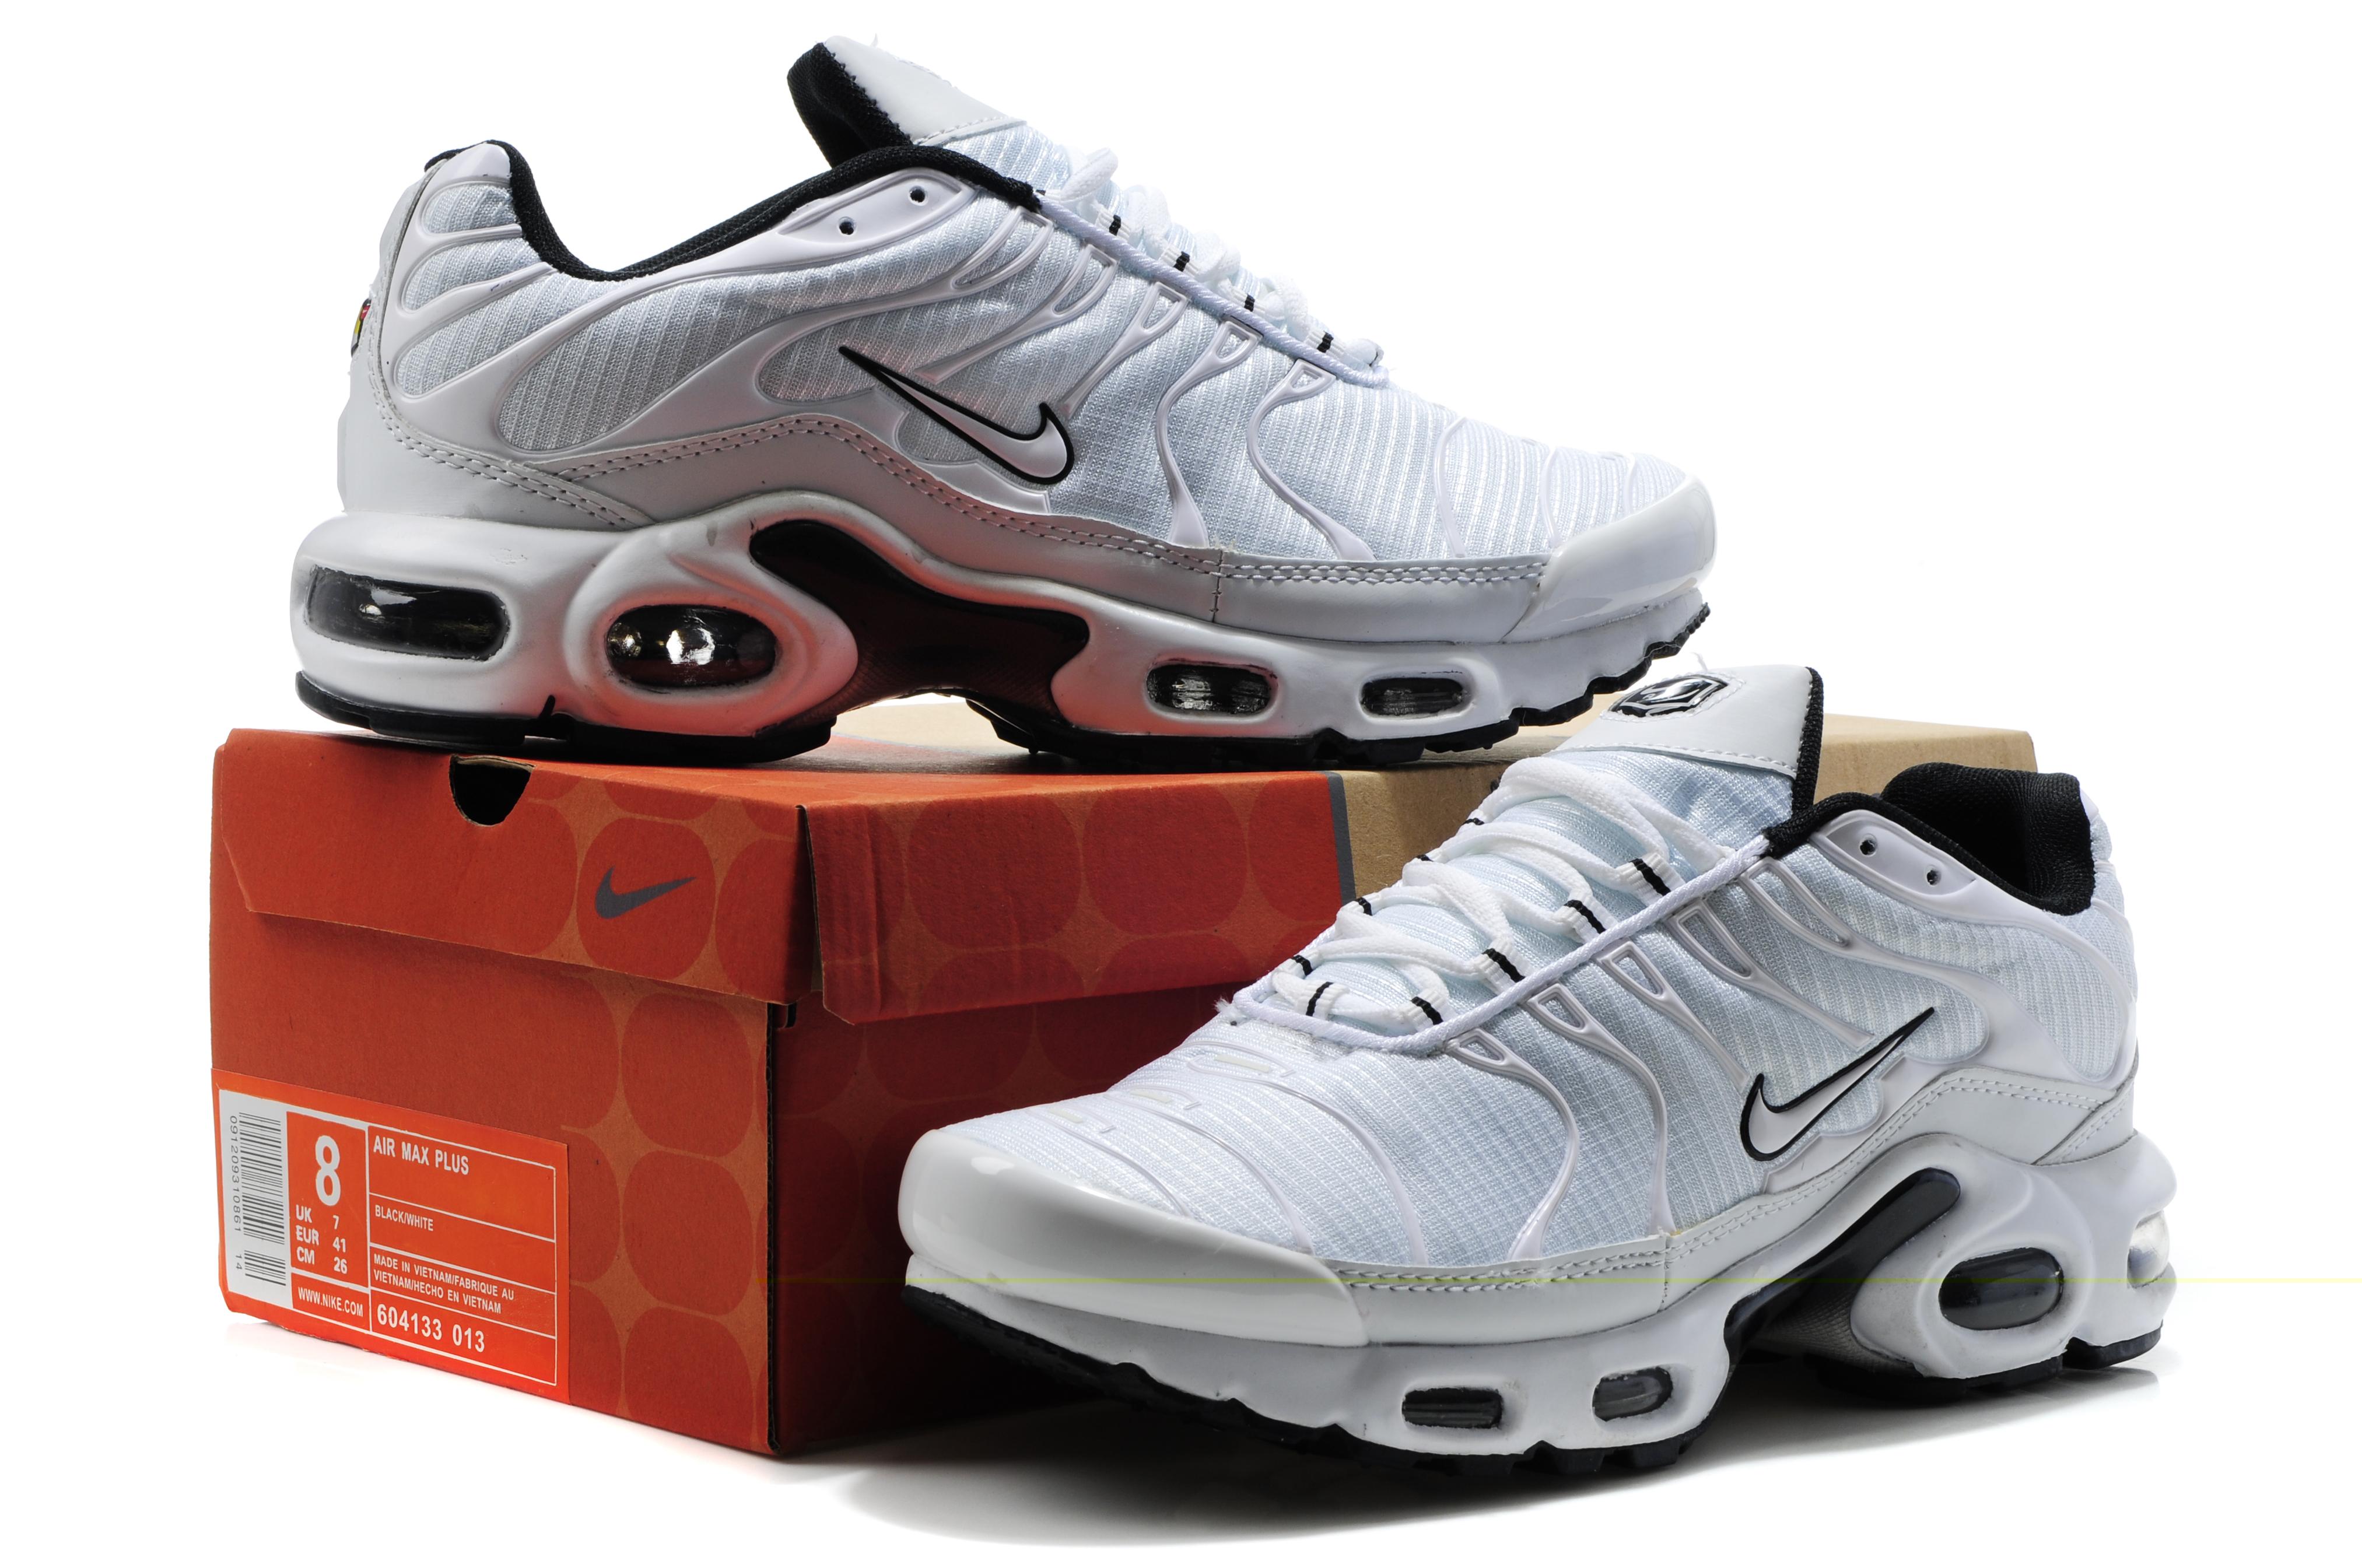 big sale f92fa 953fd achat Baskets Vente Foot Requin Pas Locker Chaussures Cher Nike qBapw4p